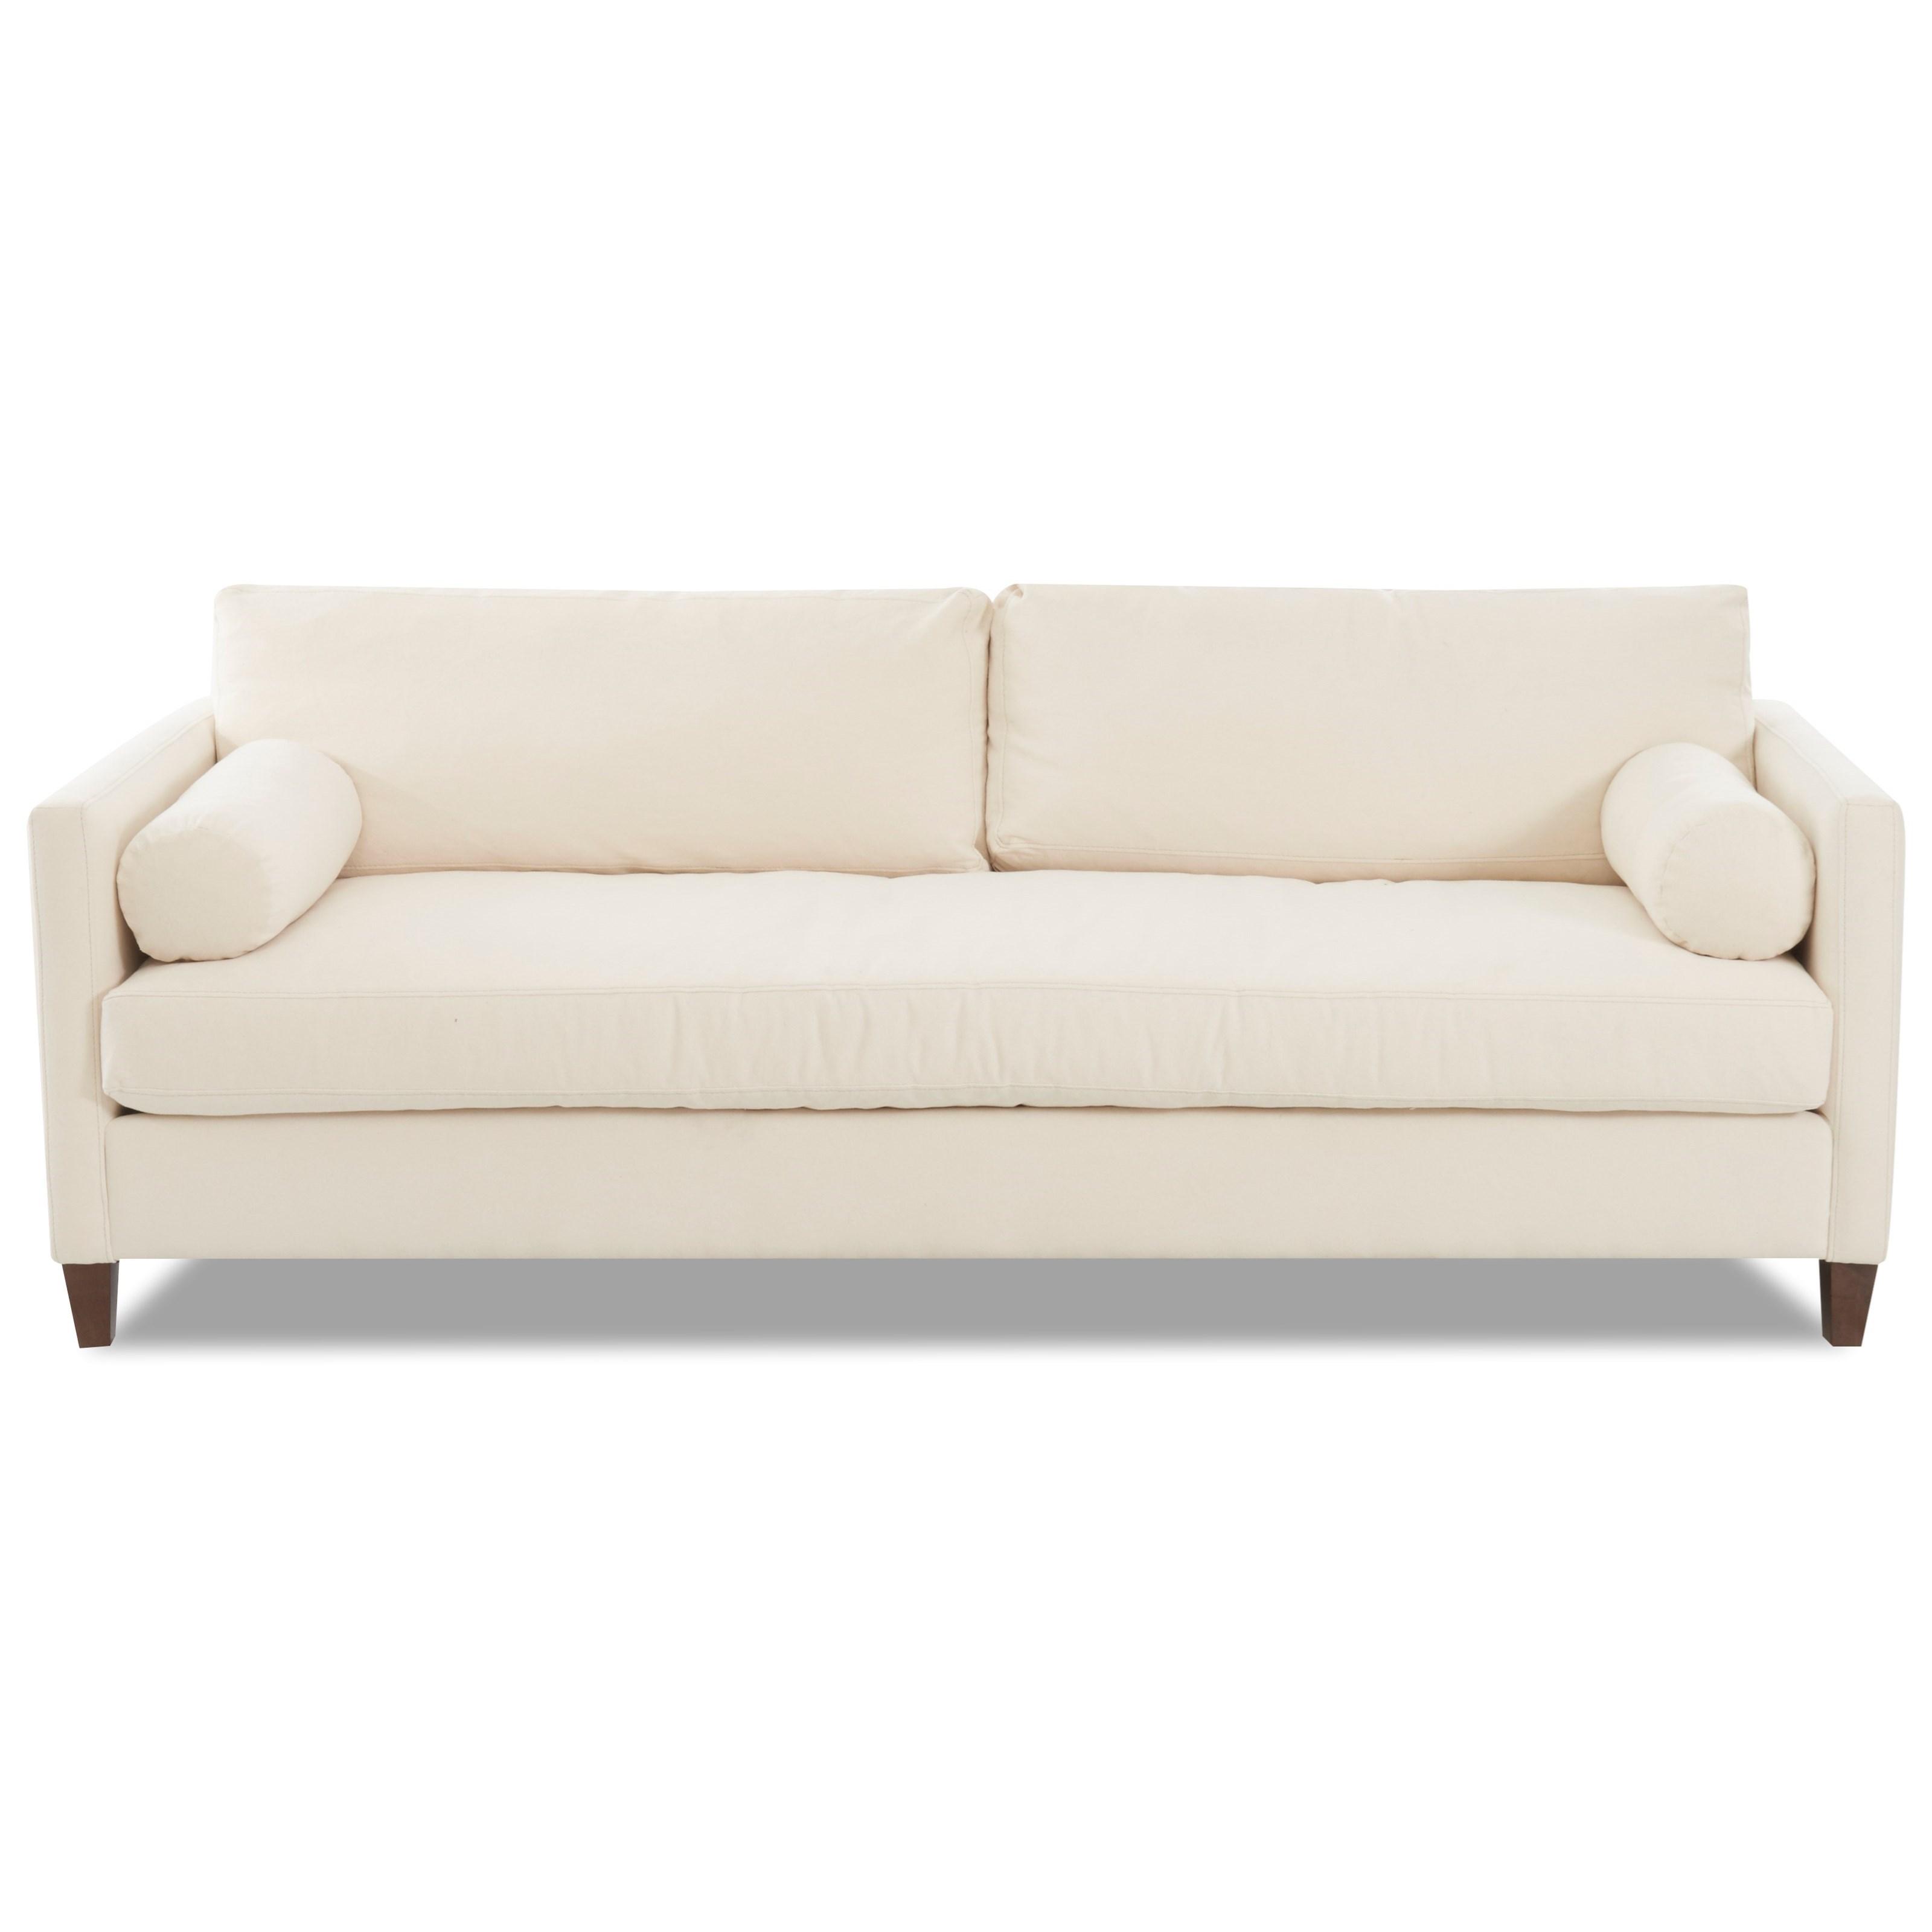 Brinley Sofa by Klaussner at Johnny Janosik